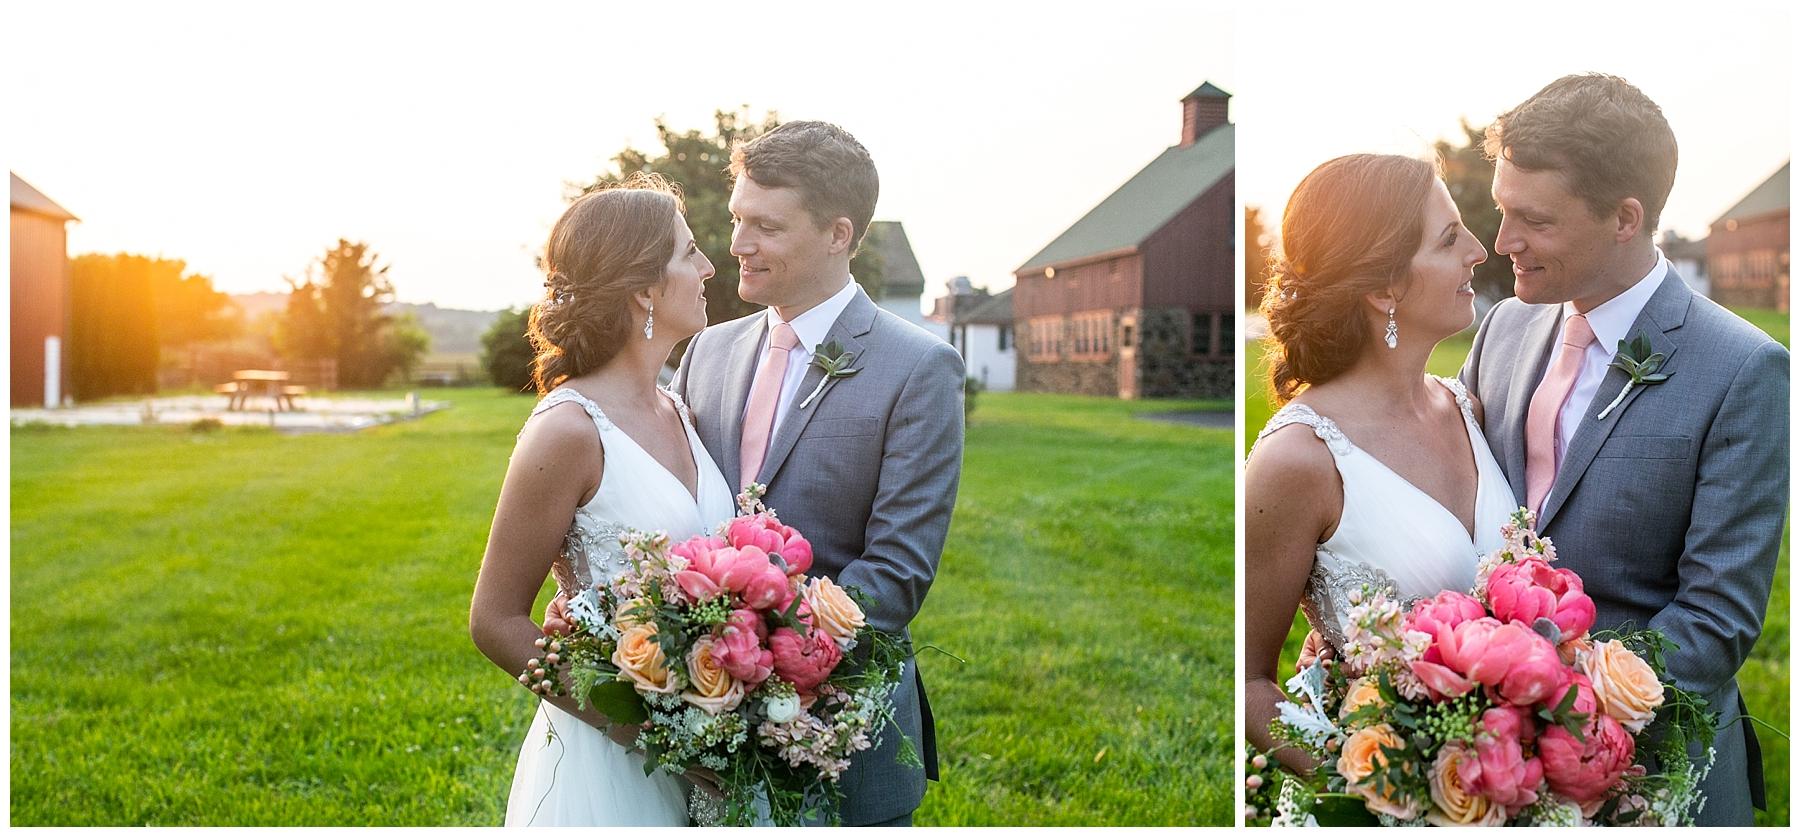 Chelsea Phil Bohemia River Overlook Wedding Living Radiant Photography photos_0175.jpg